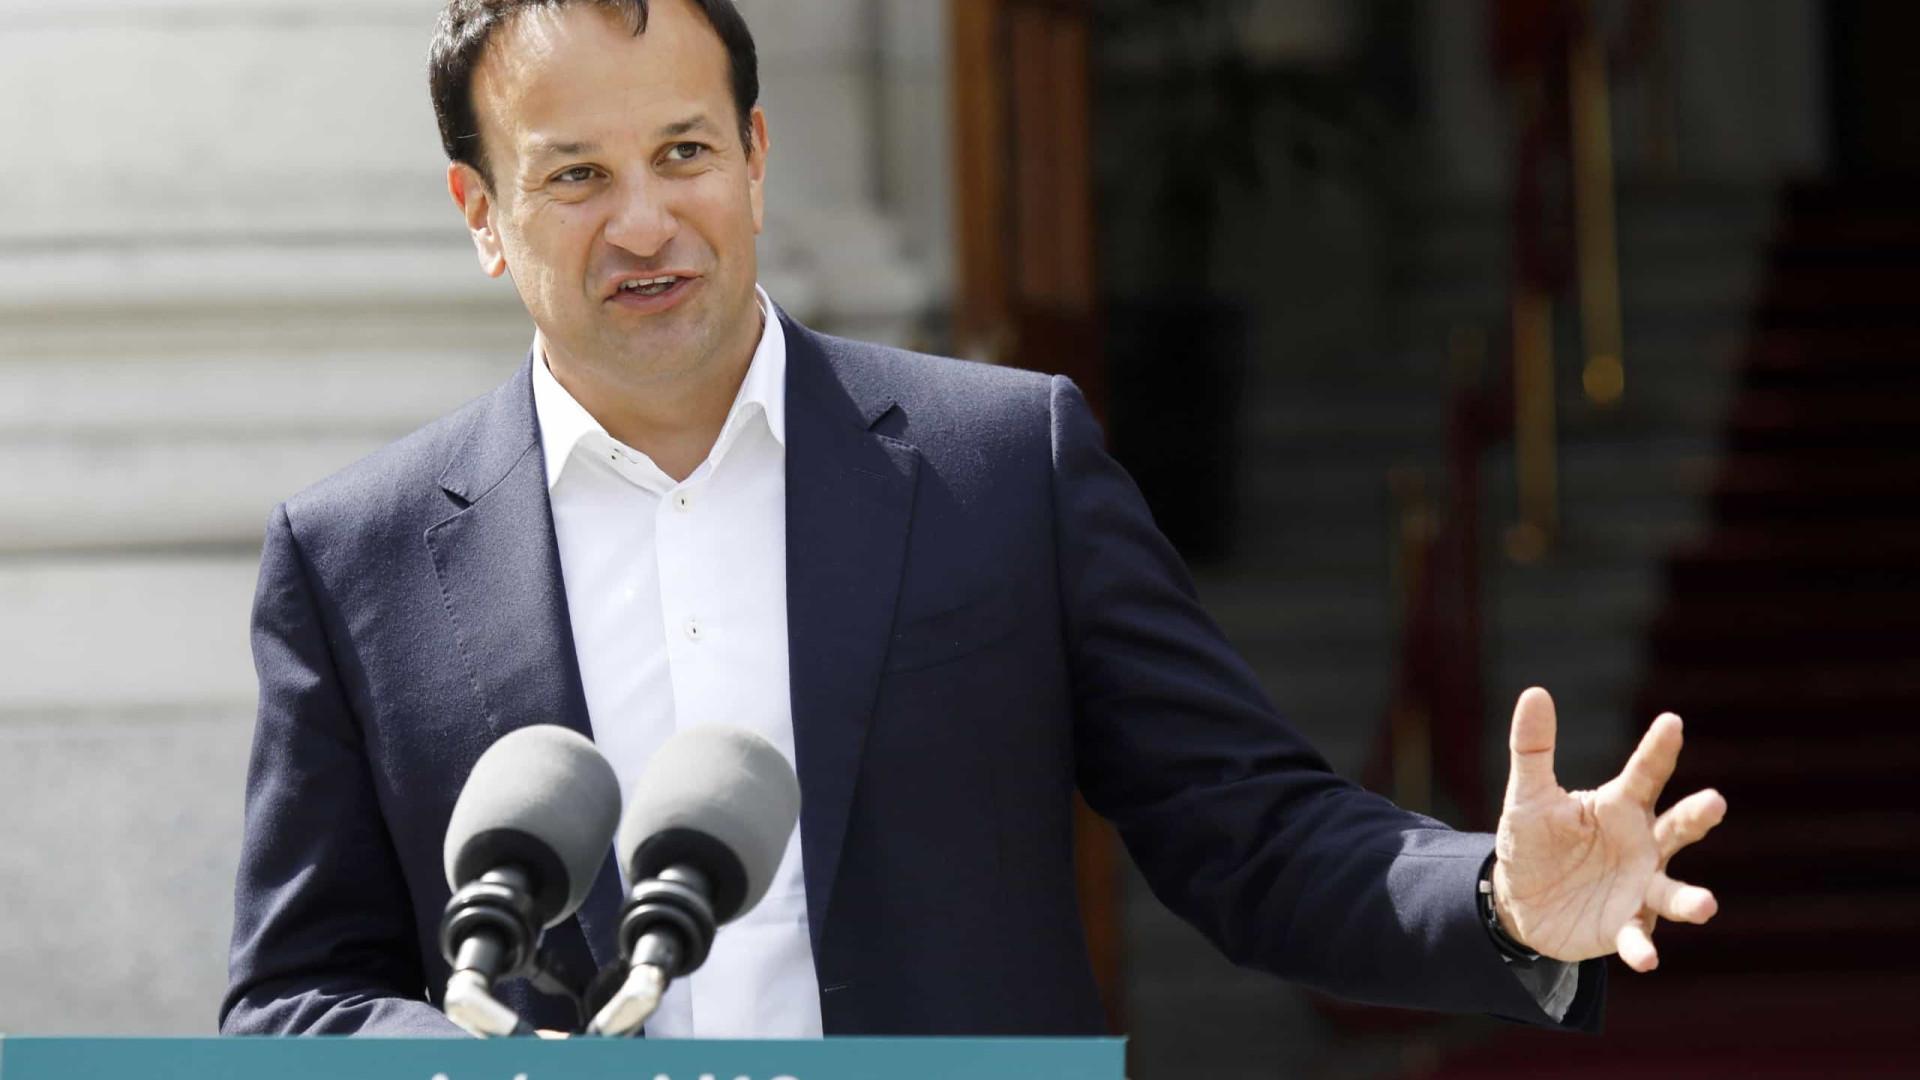 """Estamos a progredir"". Irlanda vai acelerar desconfinamento"